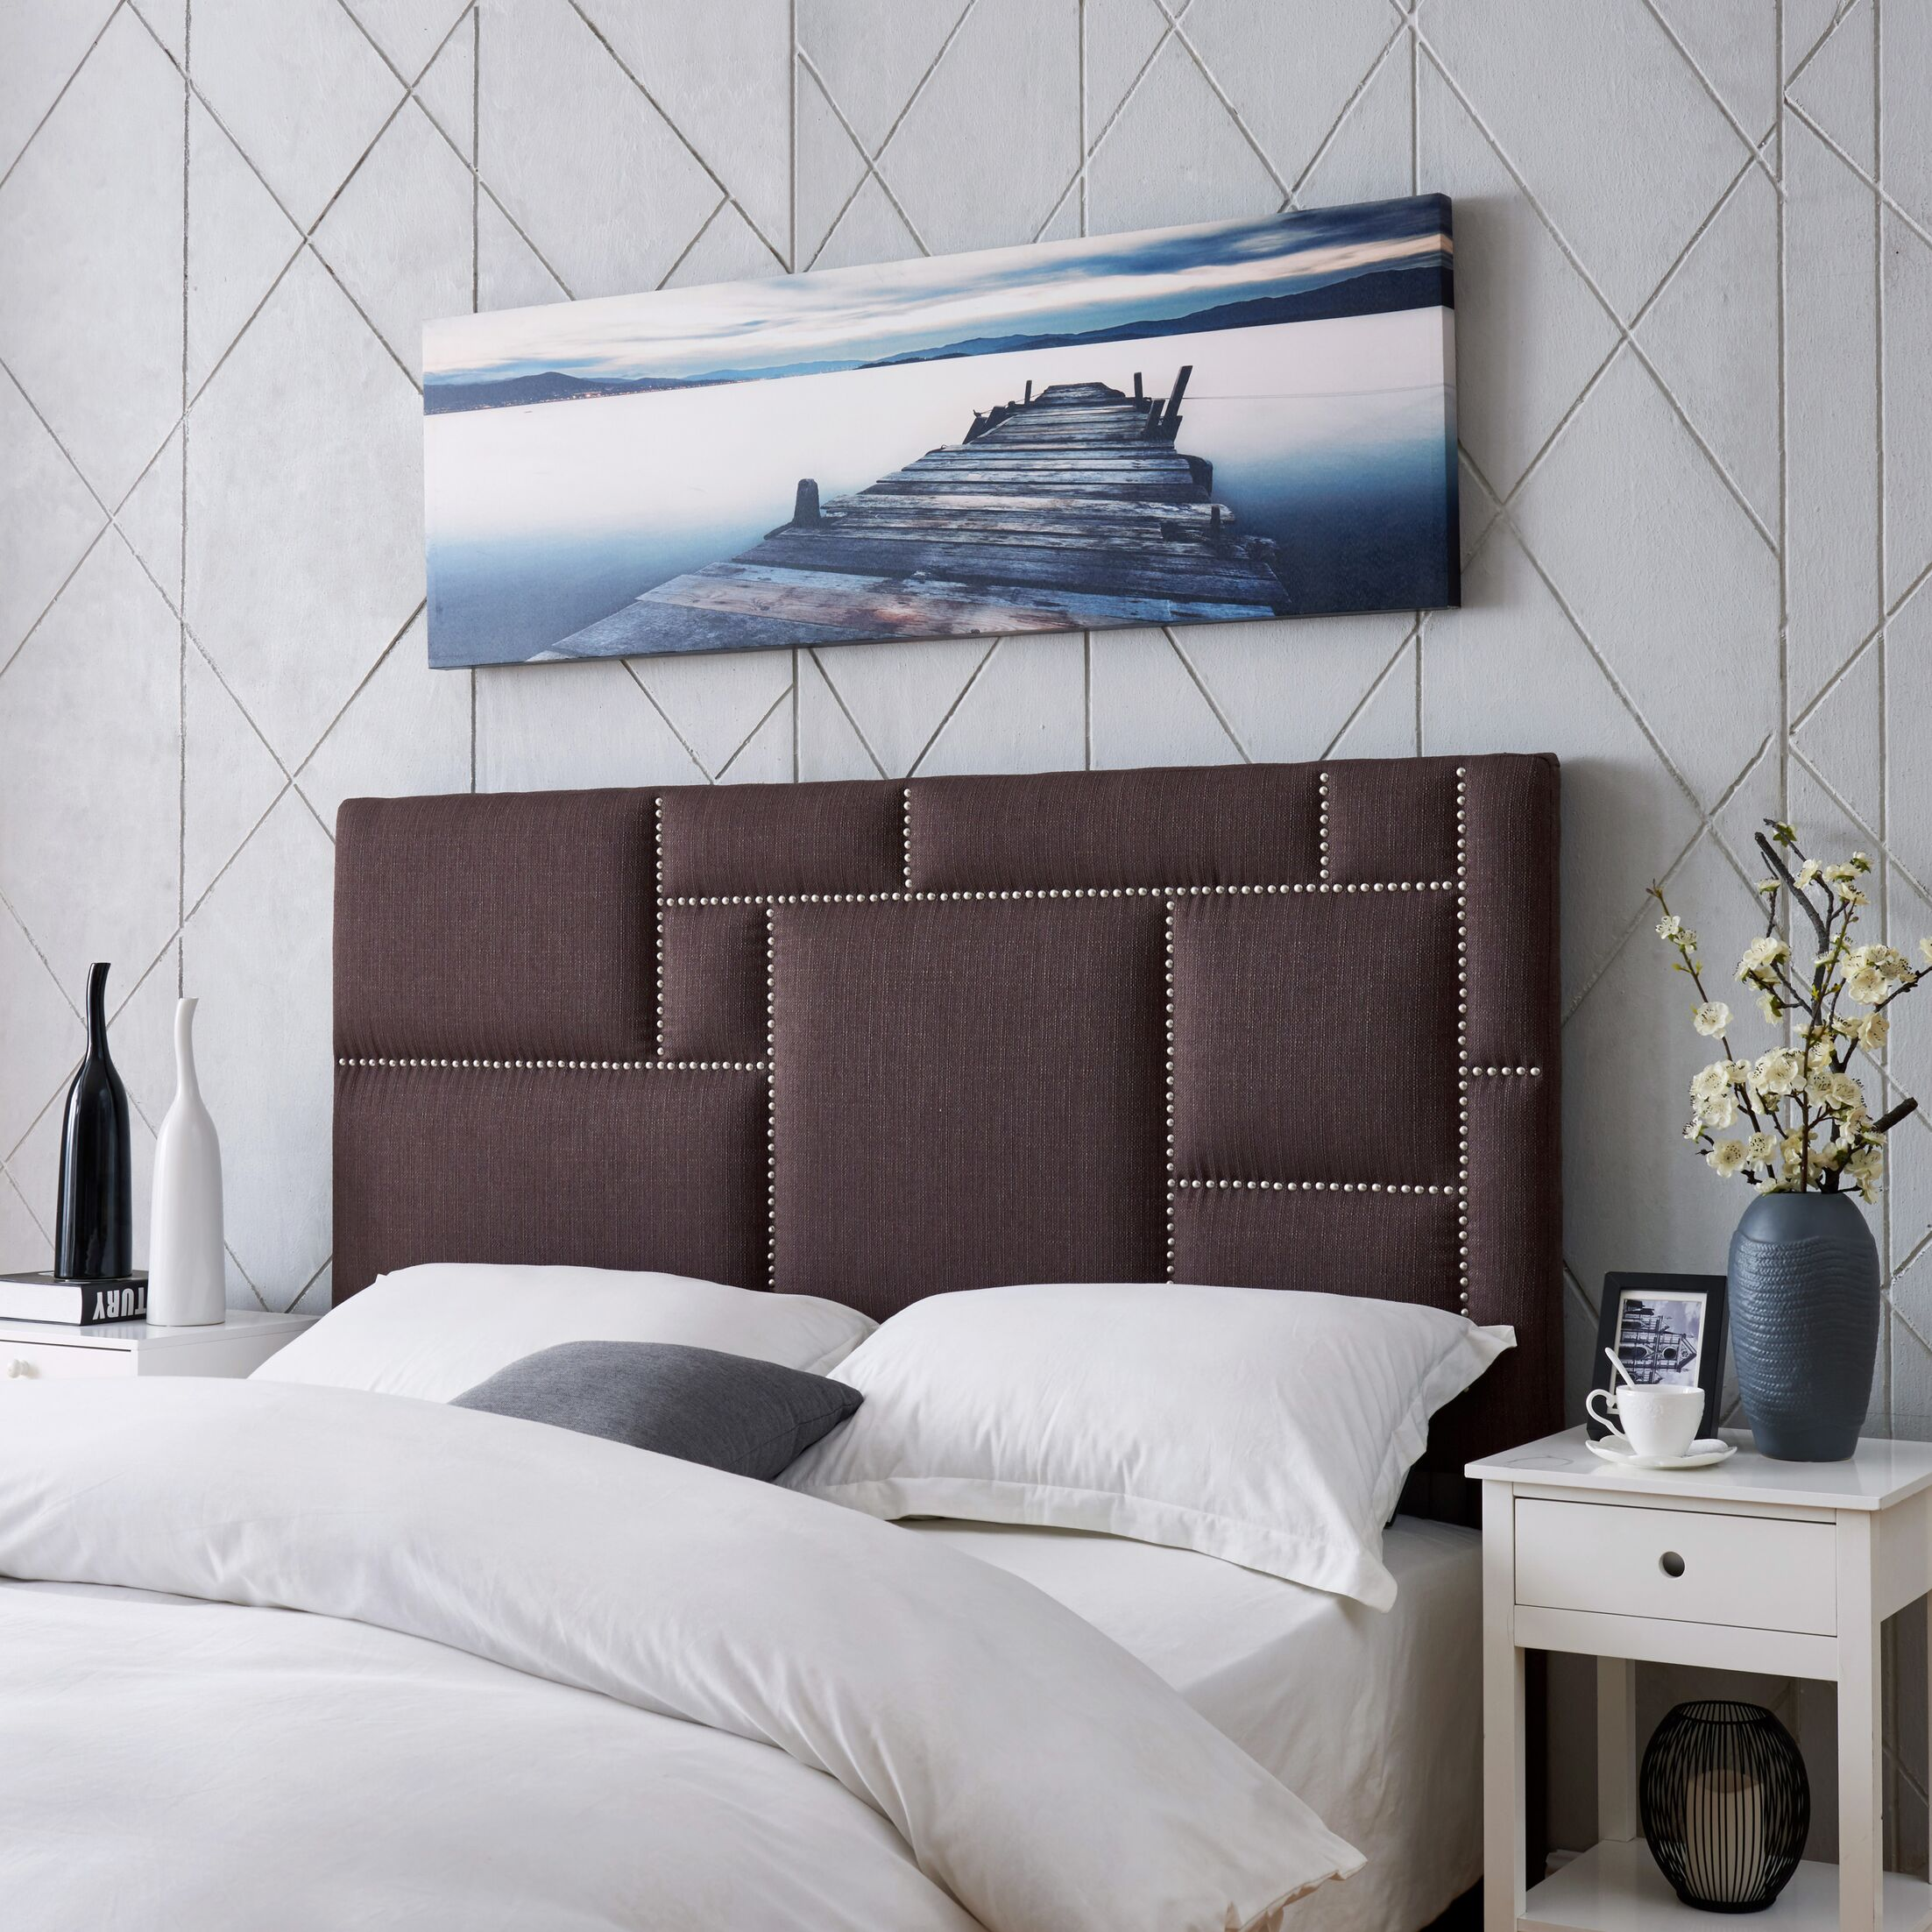 Kerner Upholstered Panel Headboard Size: Full/Queen, Upholstery: Brown